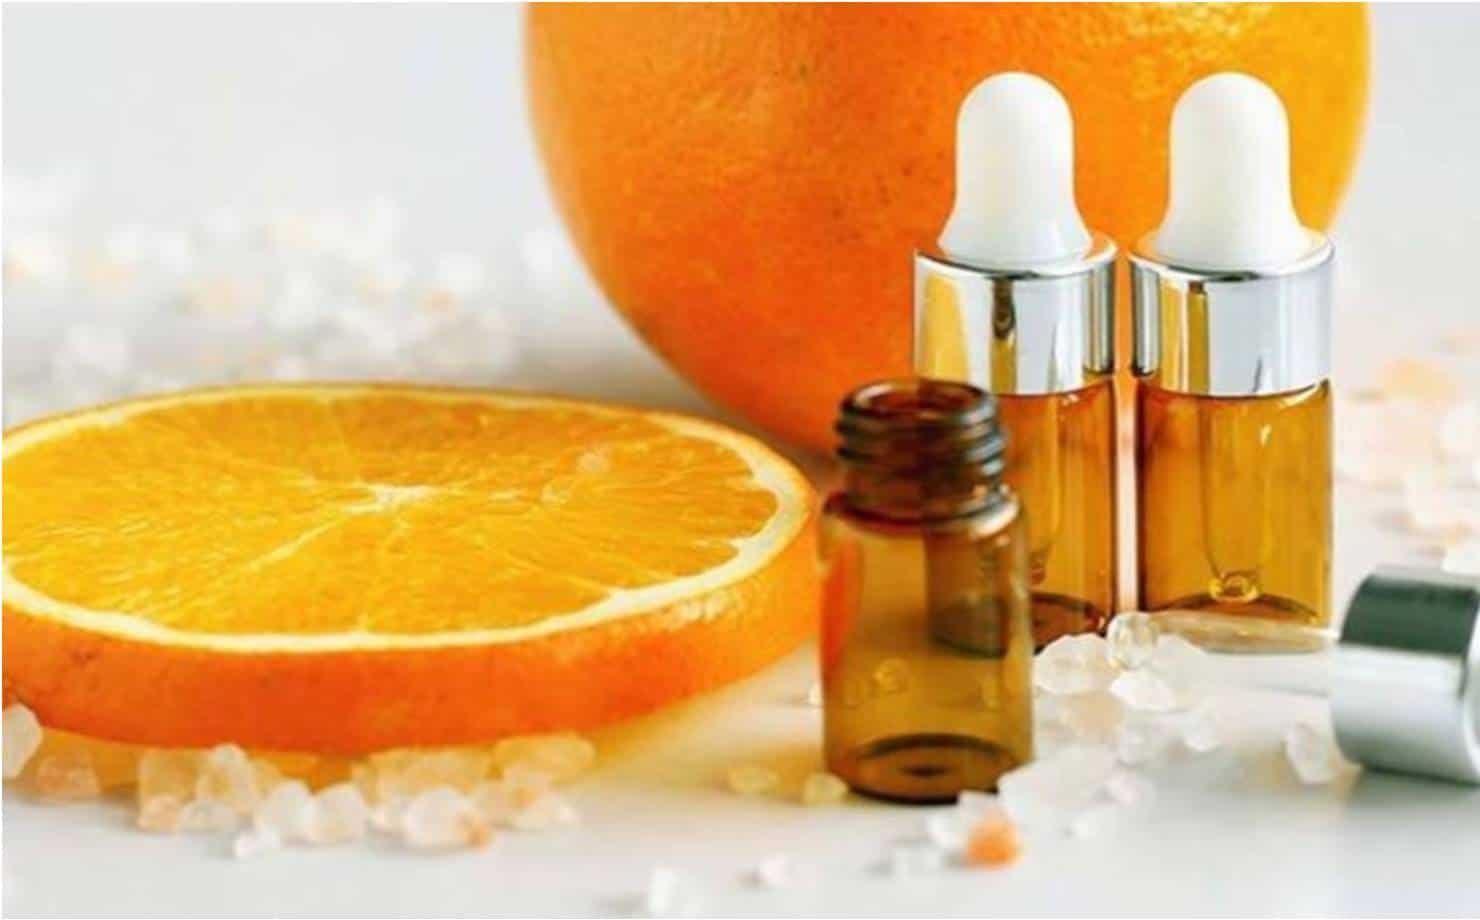 Como fazer um soro caseiro de vitamina C para tirar manchas do rosto